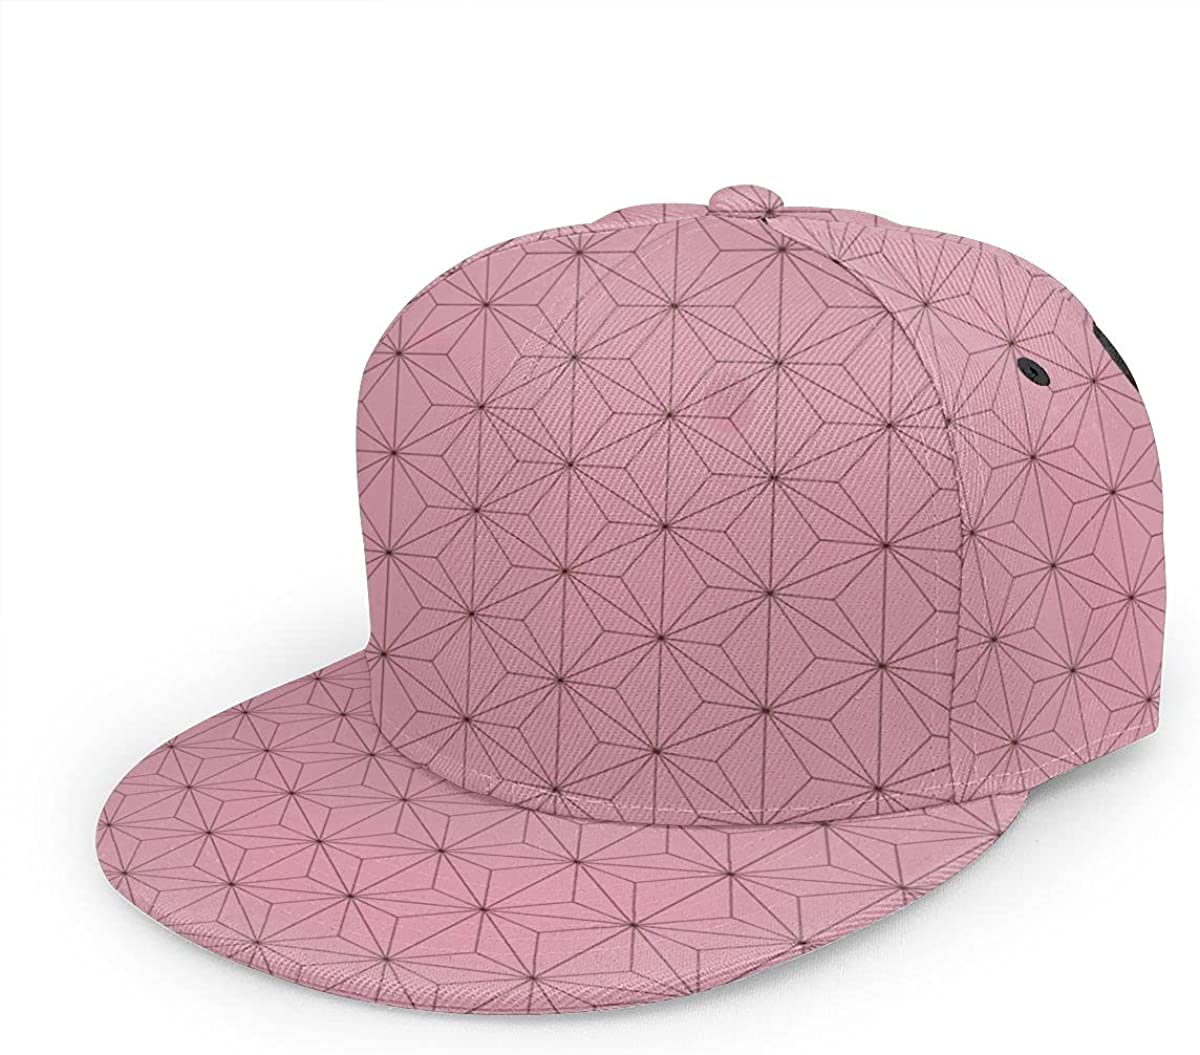 Baseball Cap Anime Print Unisex Outdoor Cap Snapback Hat Trendy Lightweight UV Protection Summer Adjustable